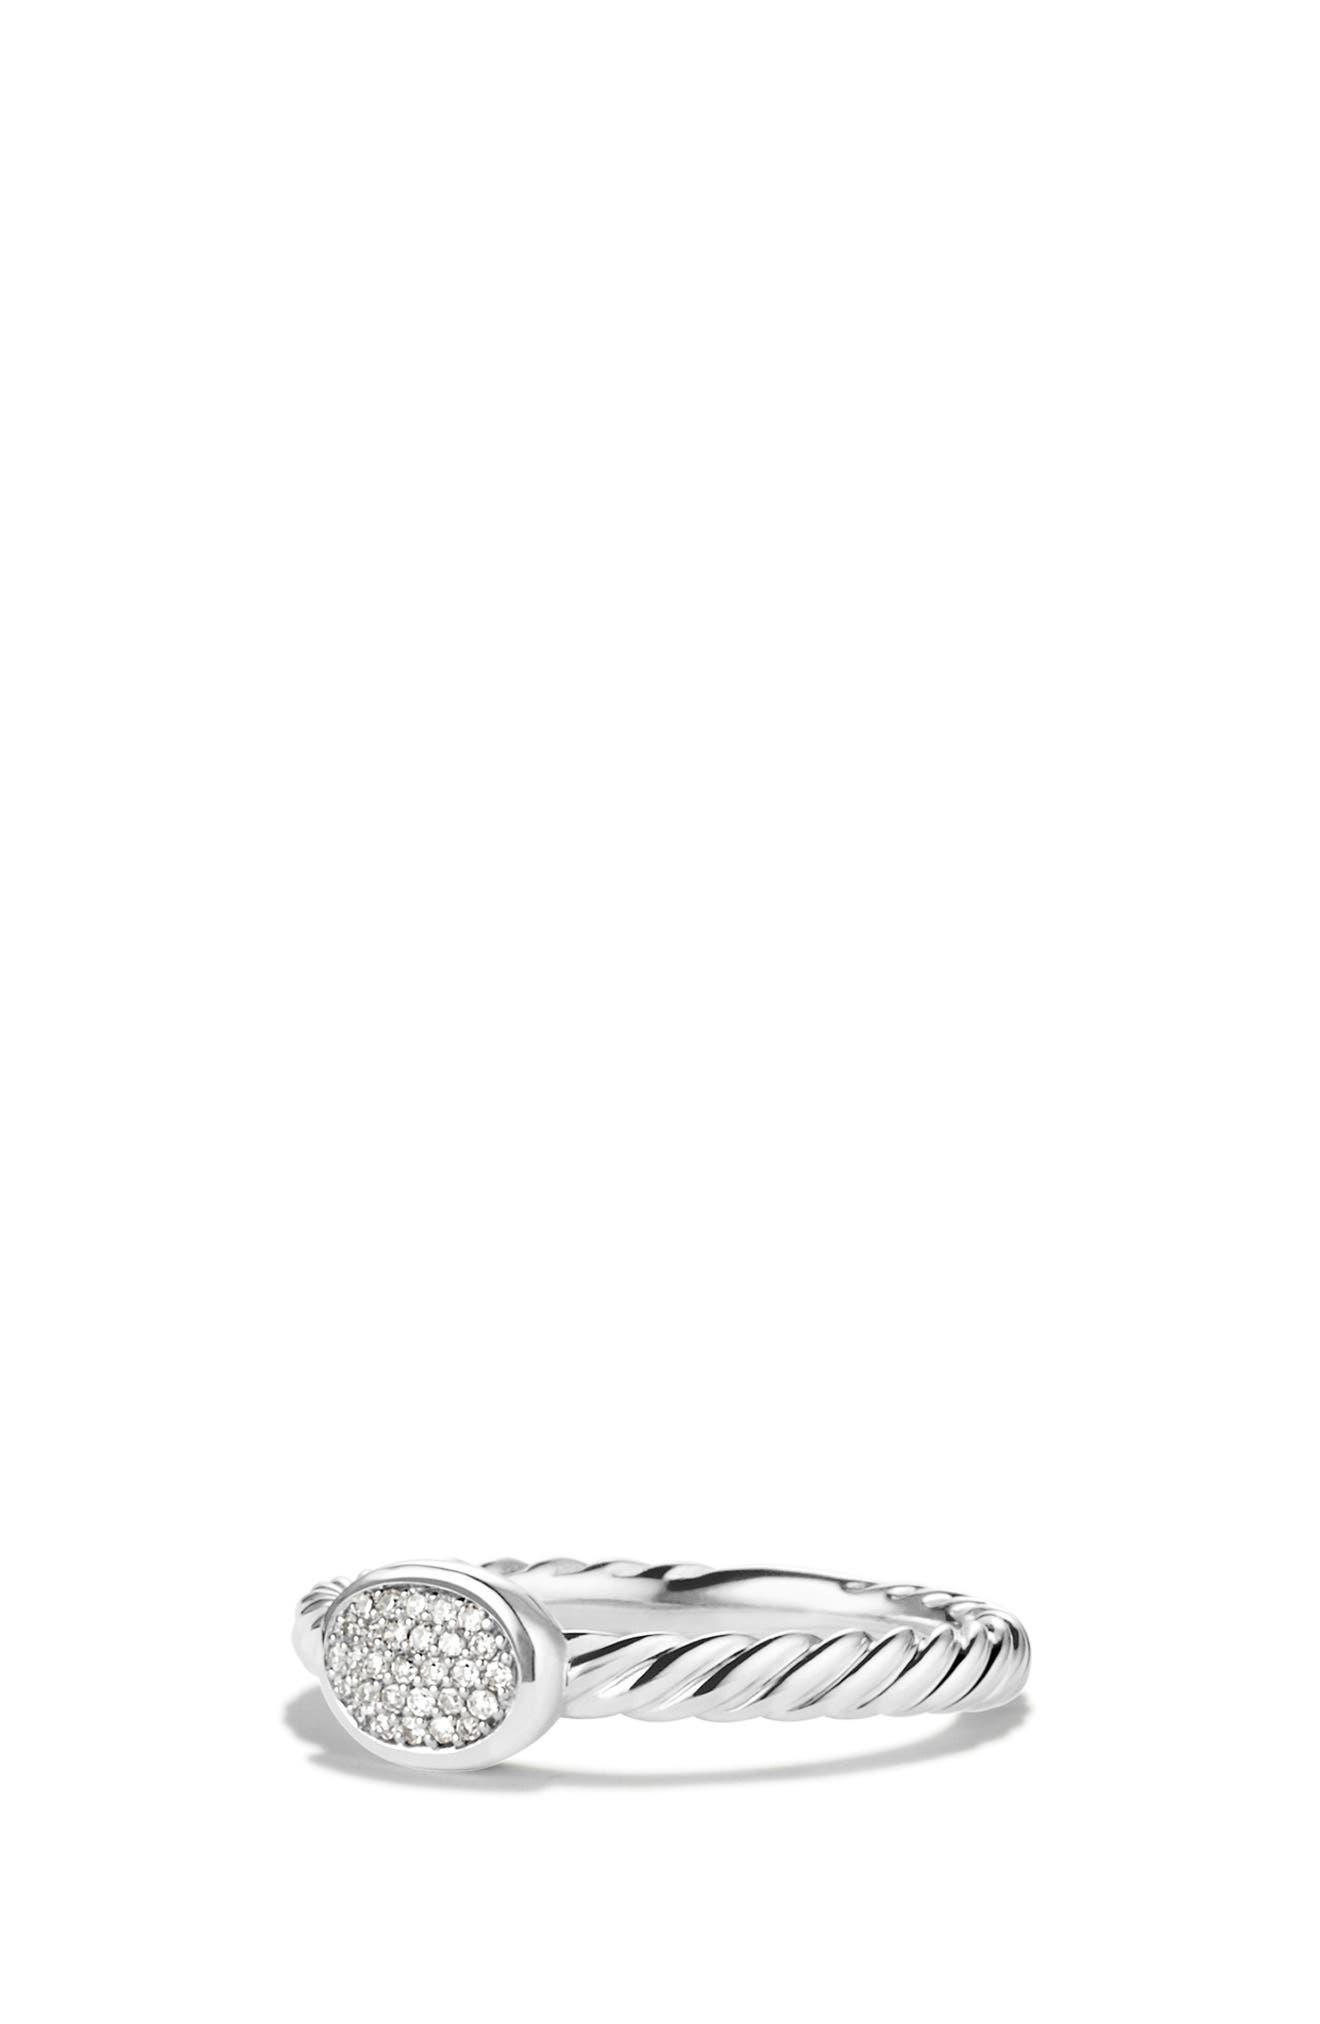 Petite Pavé Oval Ring with Diamonds,                             Main thumbnail 1, color,                             100